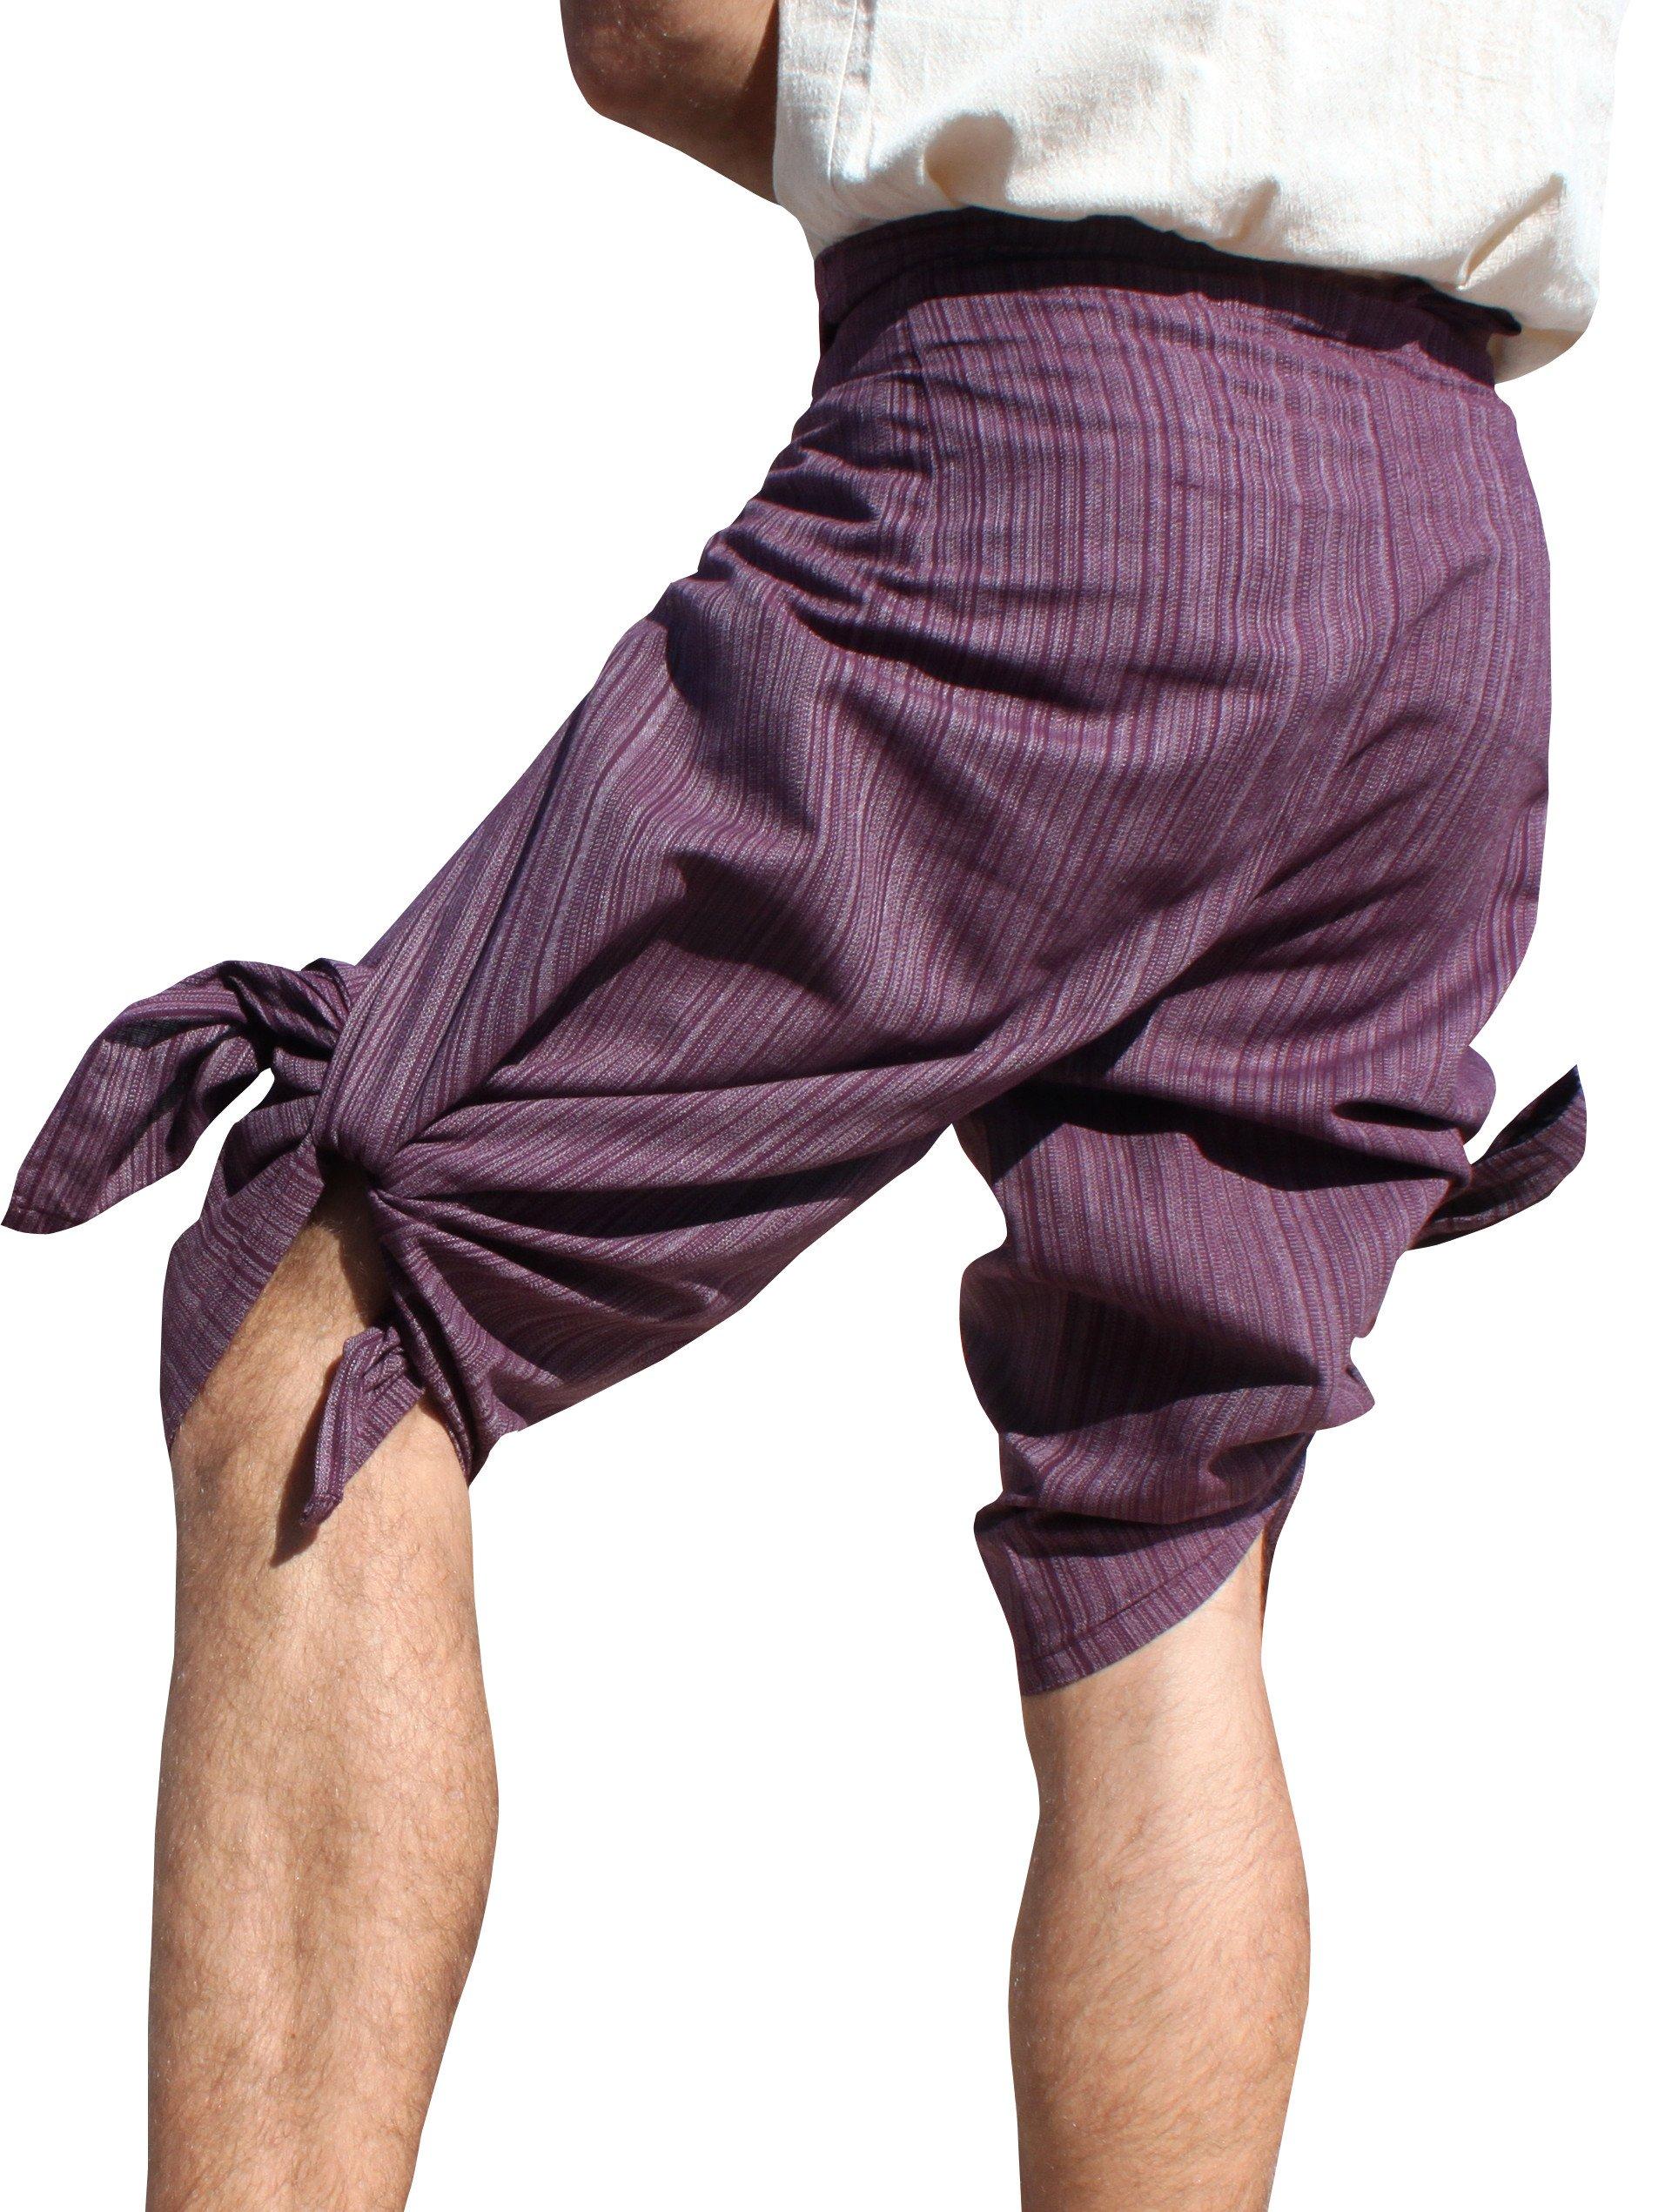 RaanPahMuang Drive In Wrap Pants In Summer Plain Mixed Cotton, Medium, TC Cotton - Plum Violet by RaanPahMuang